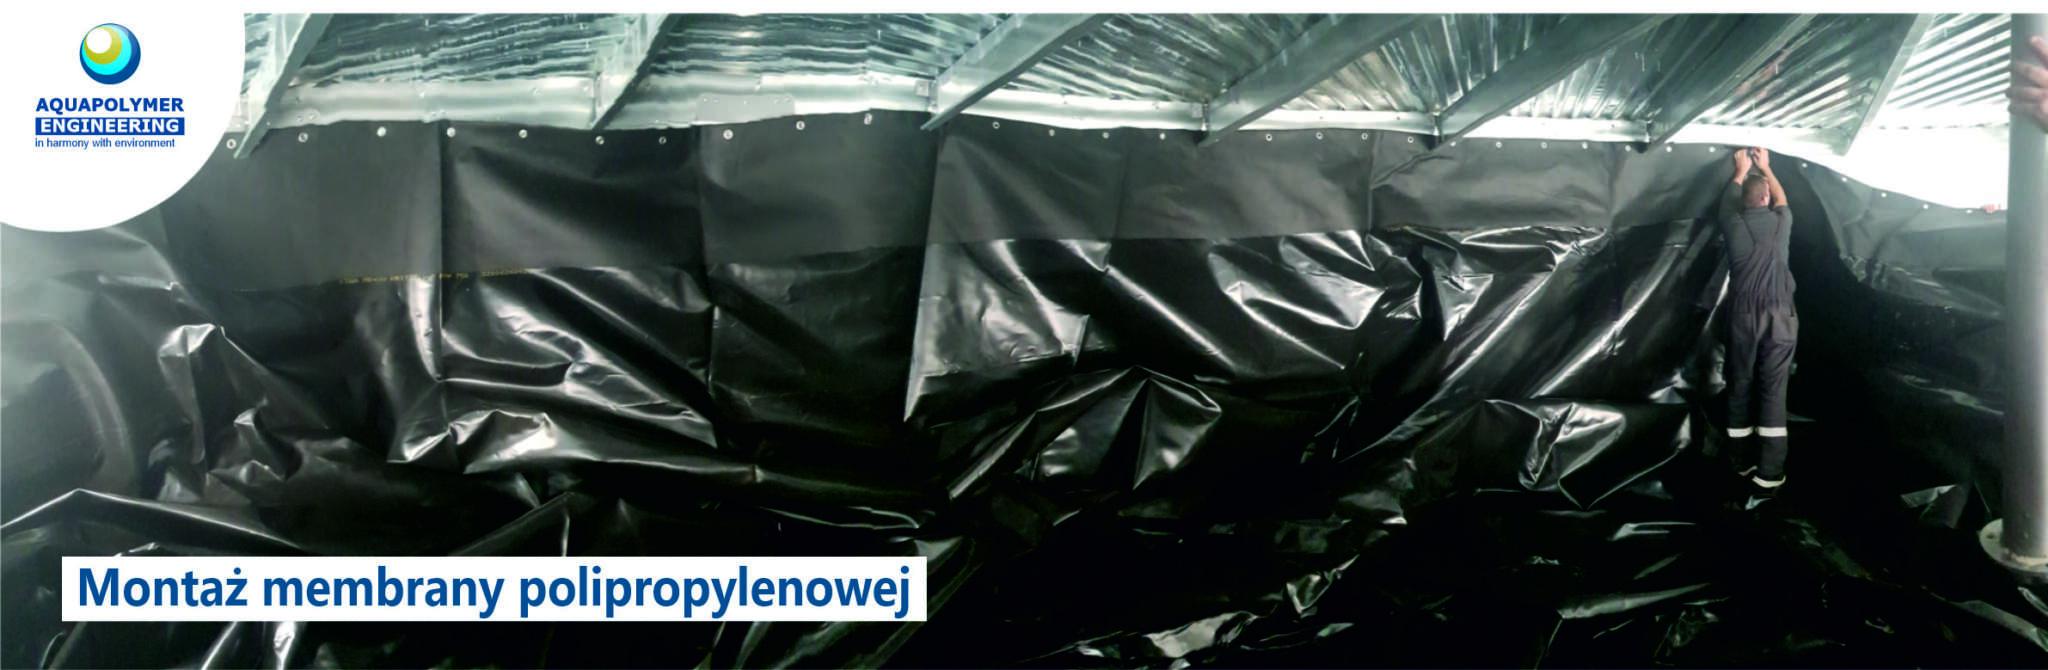 Montaż membrany polipropylenowej